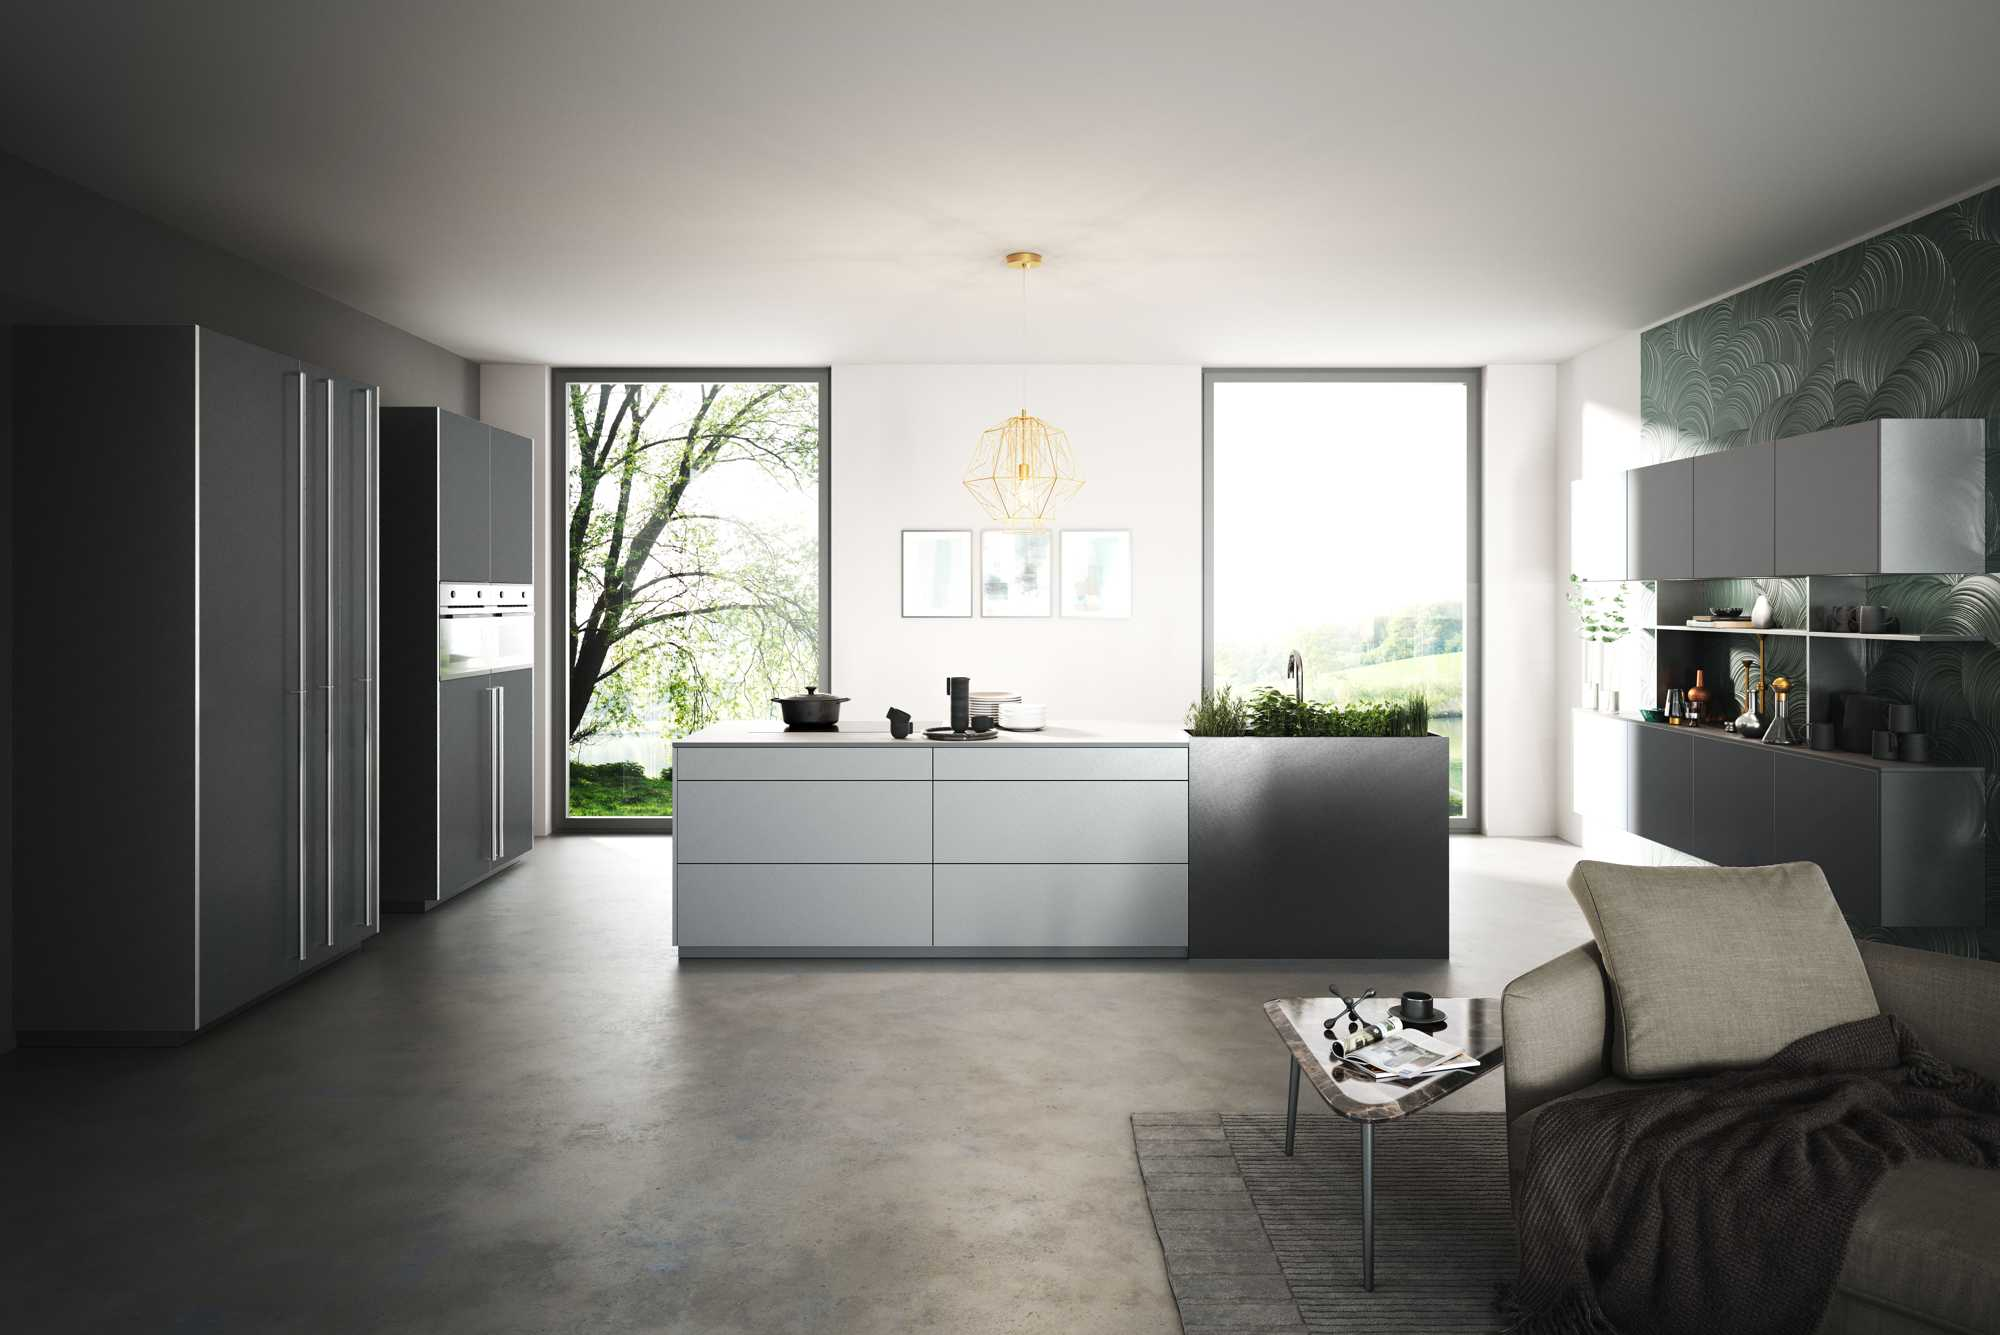 Open andspaciousTitanium metal-line kitchen